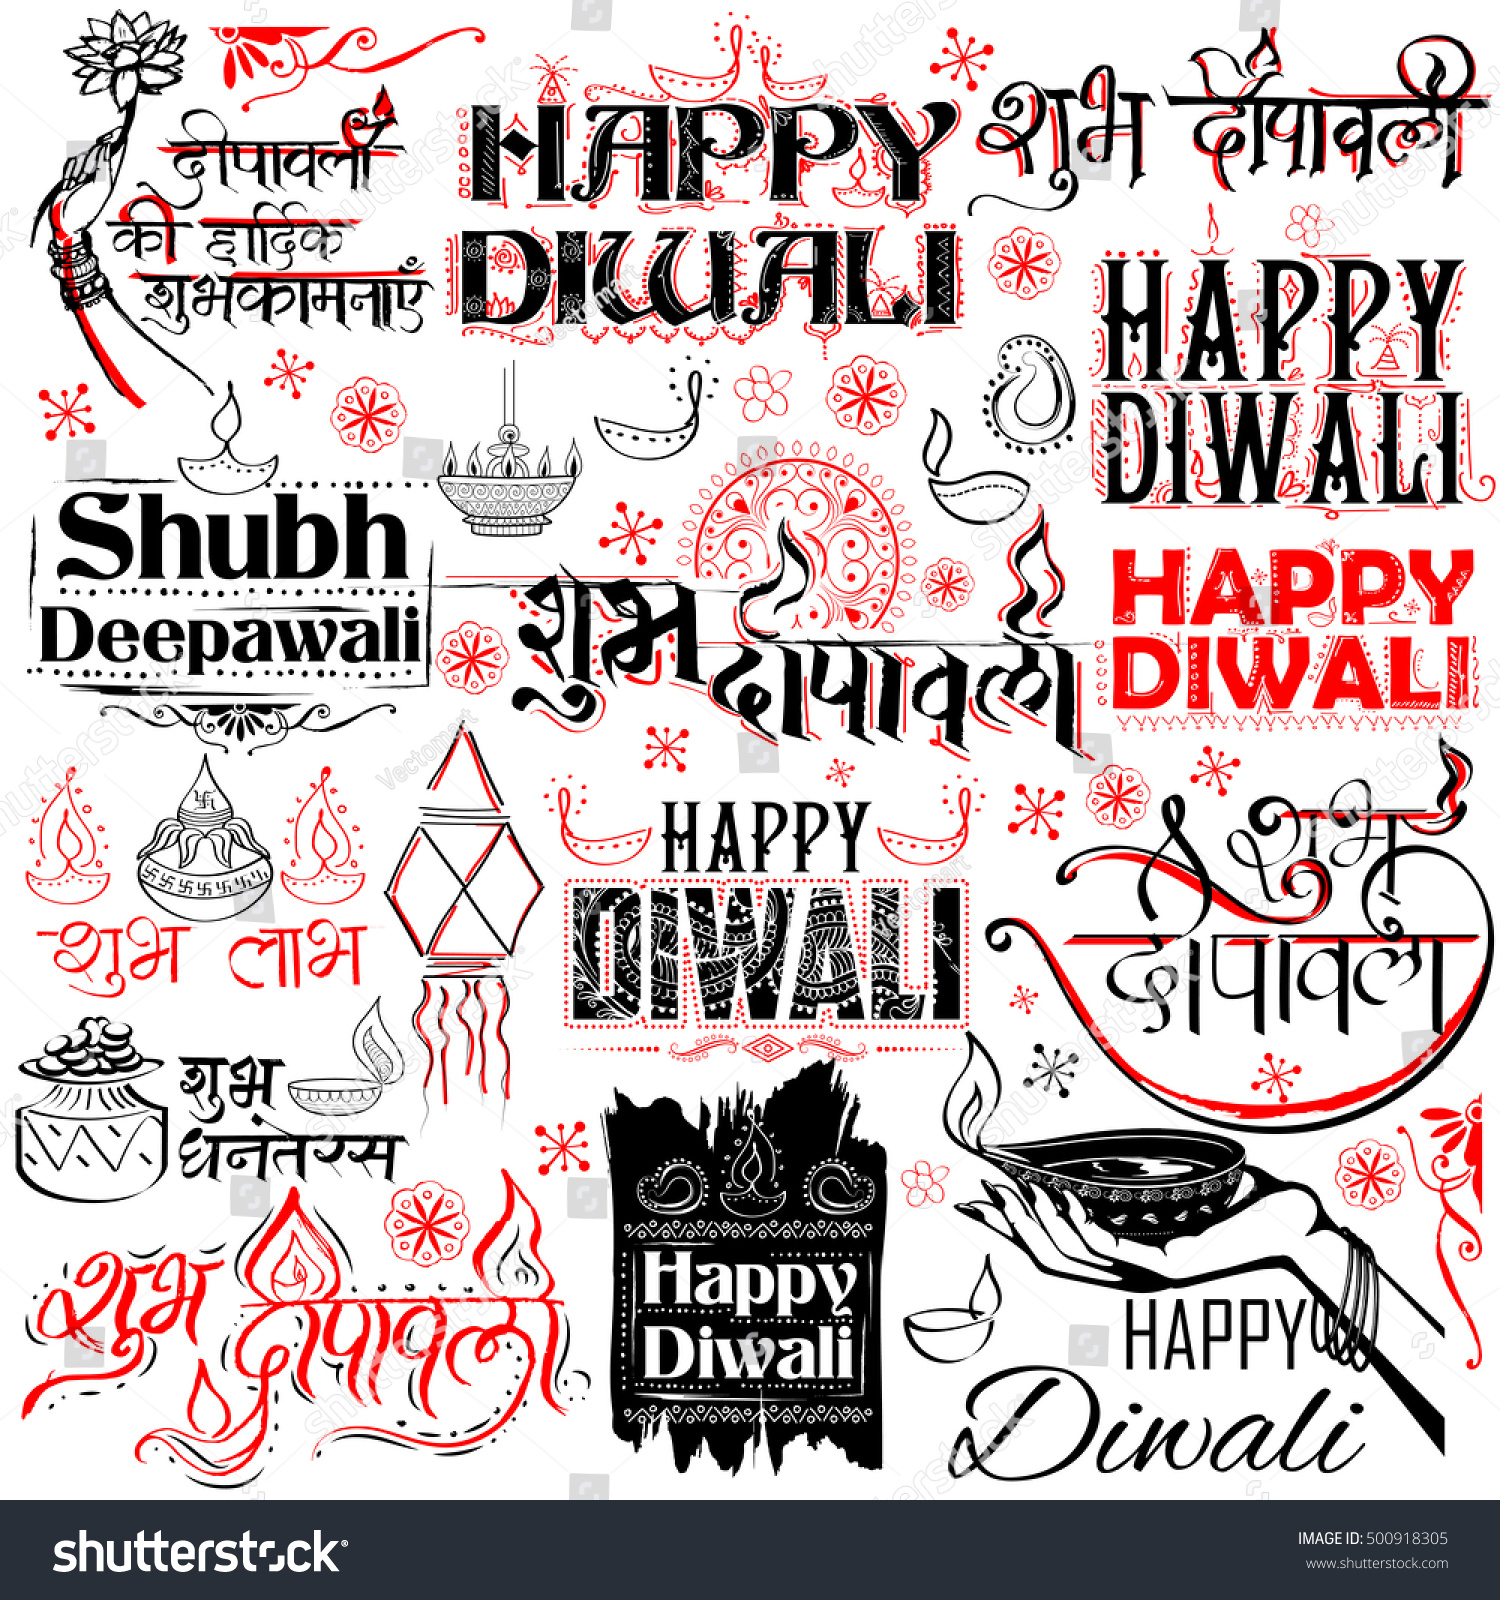 Illustration shubh deepawali happy diwali calligraphy